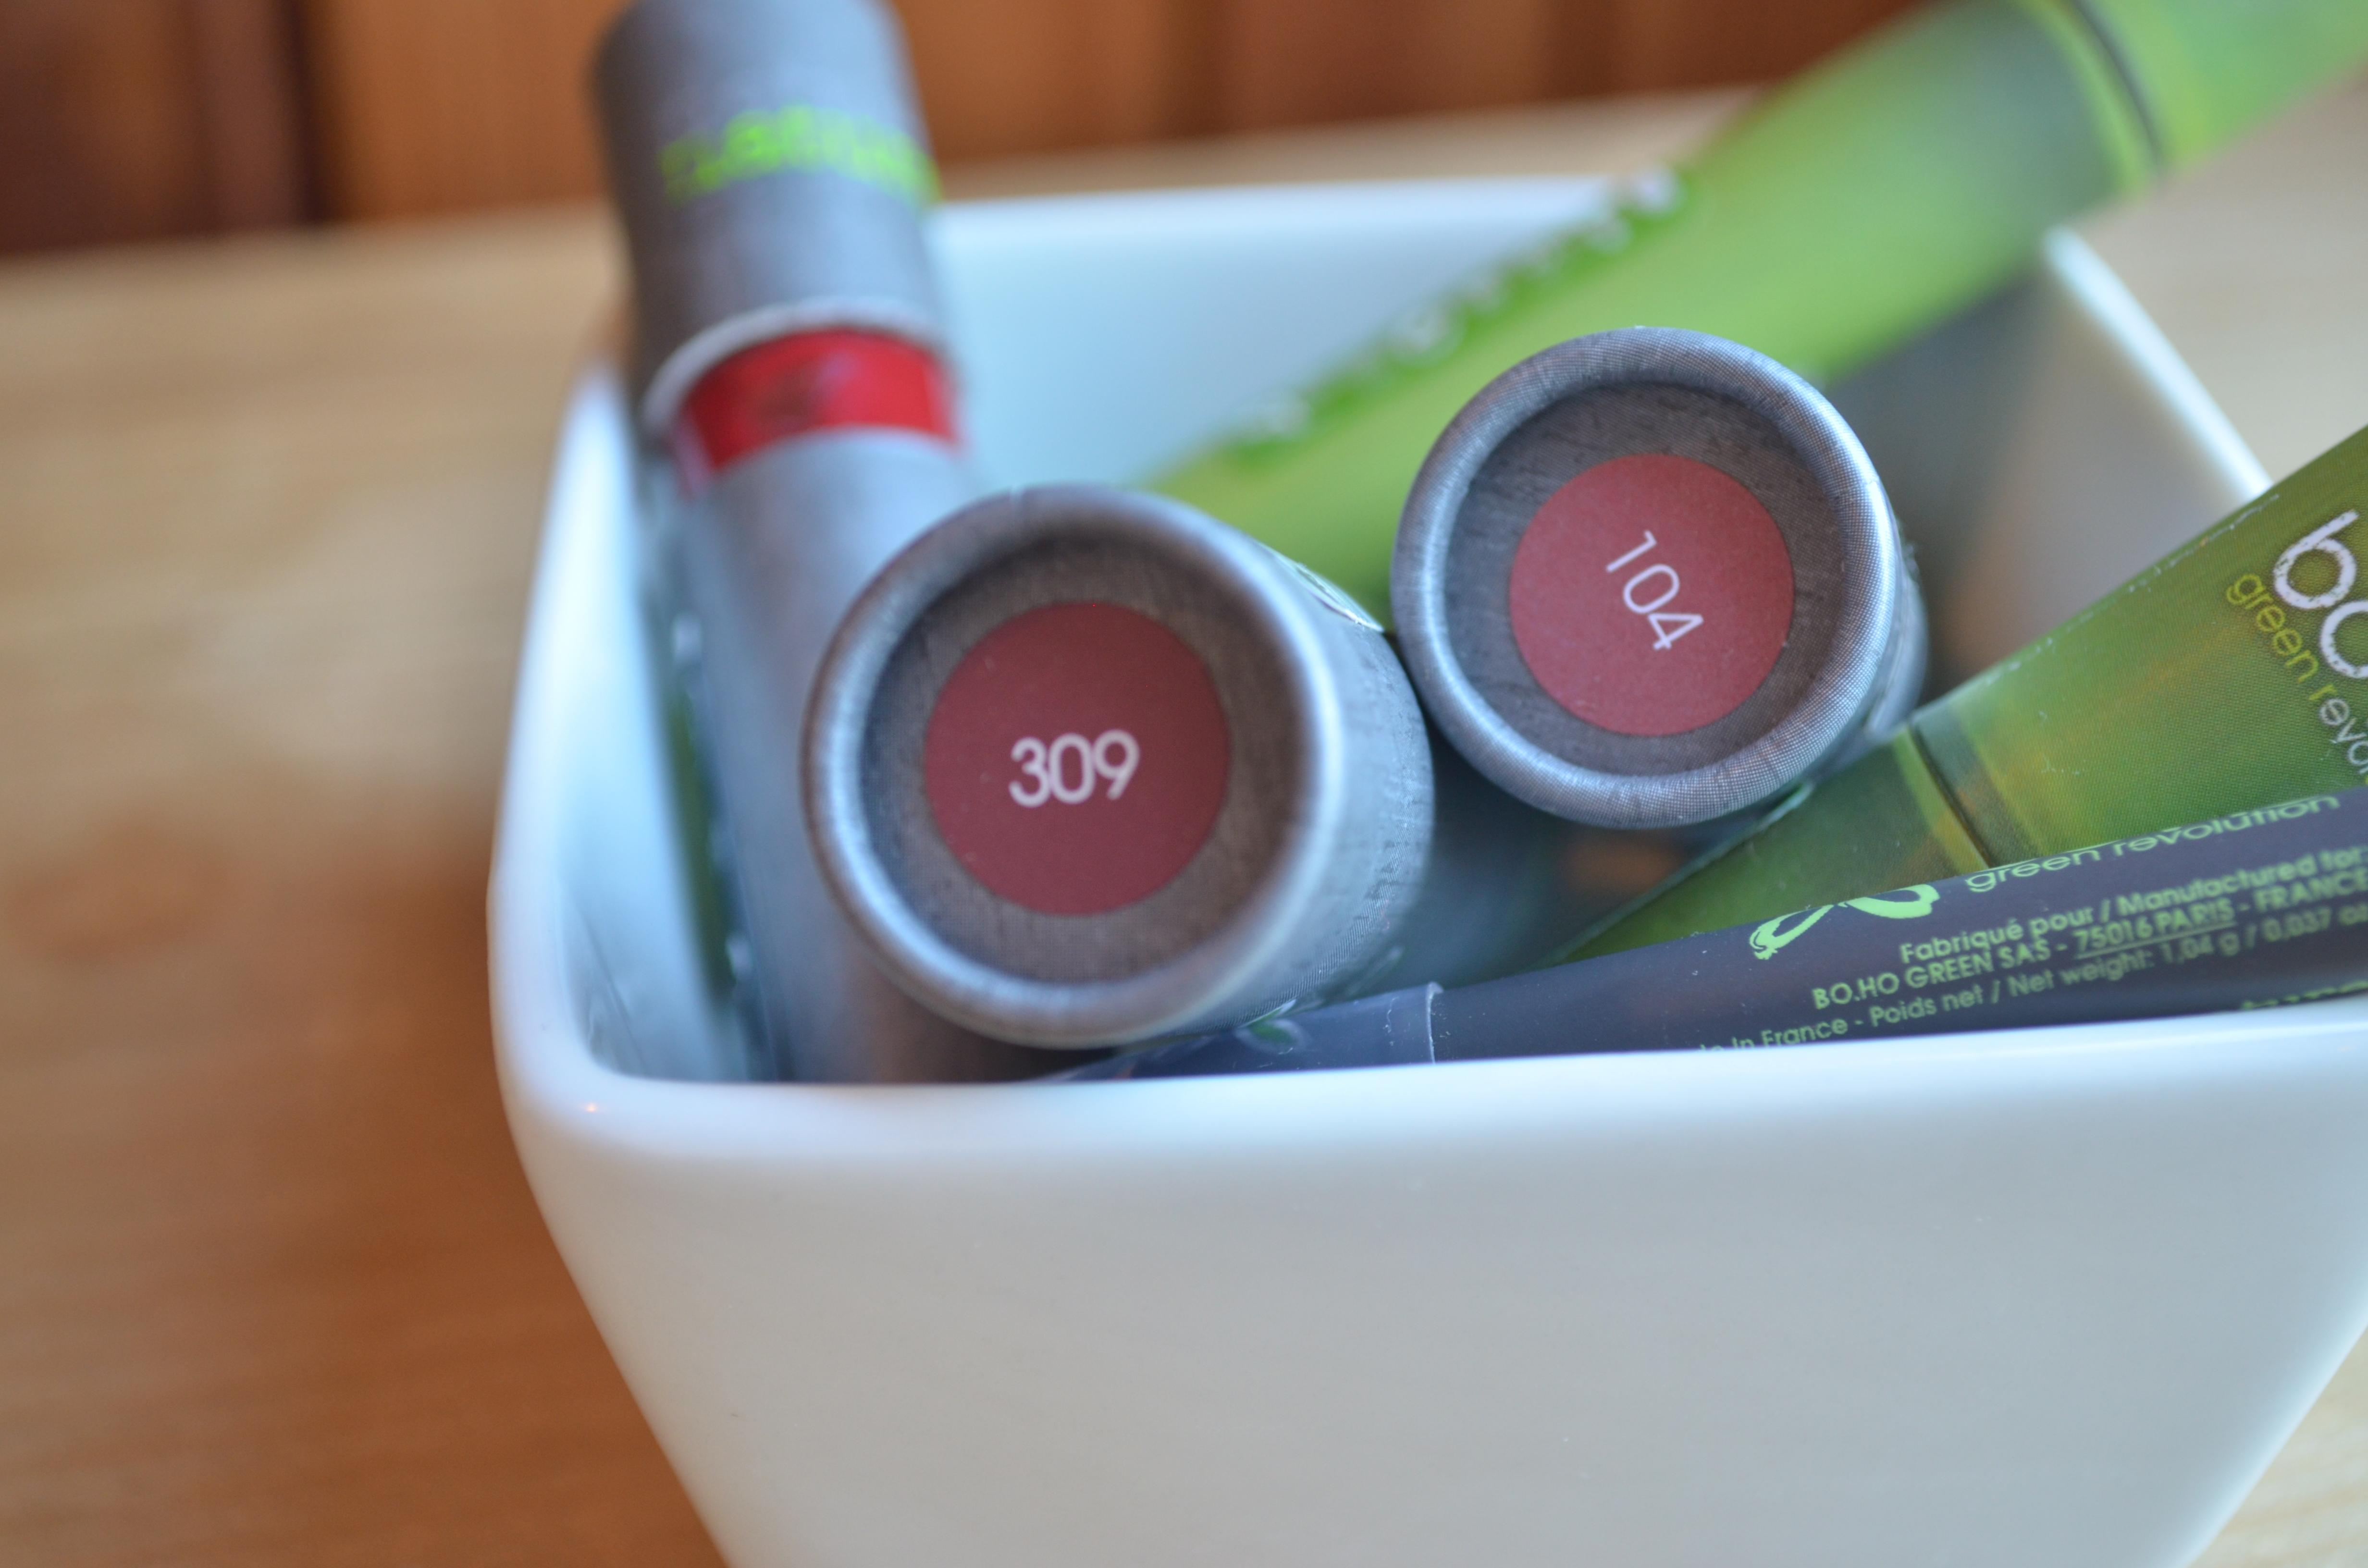 maquillage boho cosmetics